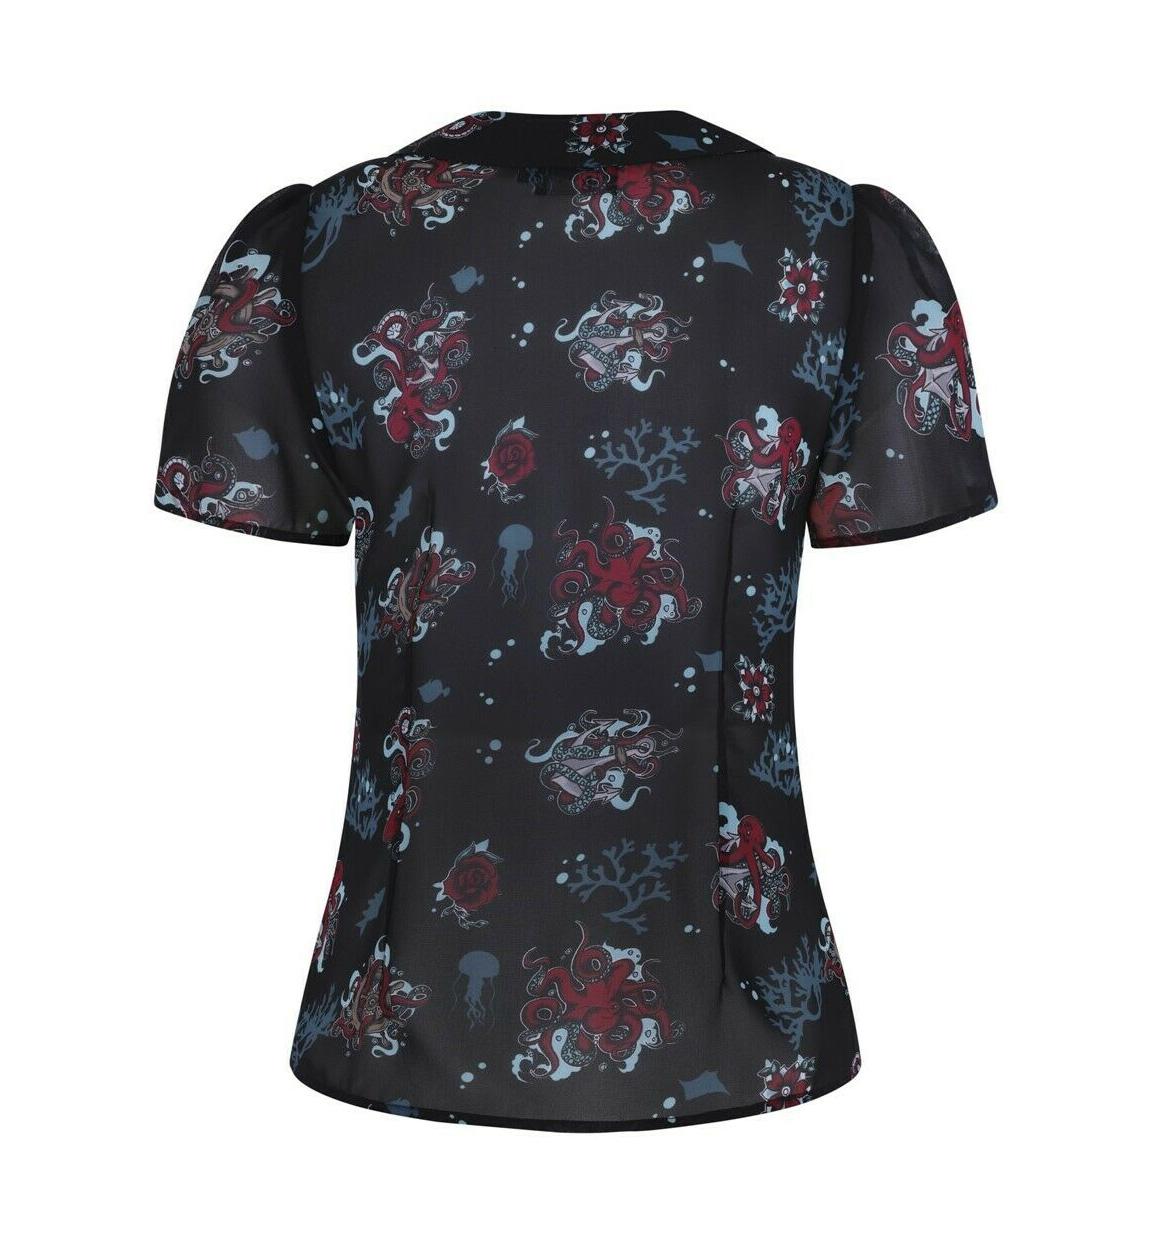 Hell-Bunny-50s-Shirt-Top-Black-Ocean-Octopus-Roses-POSEIDON-Blouse-All-Sizes thumbnail 13